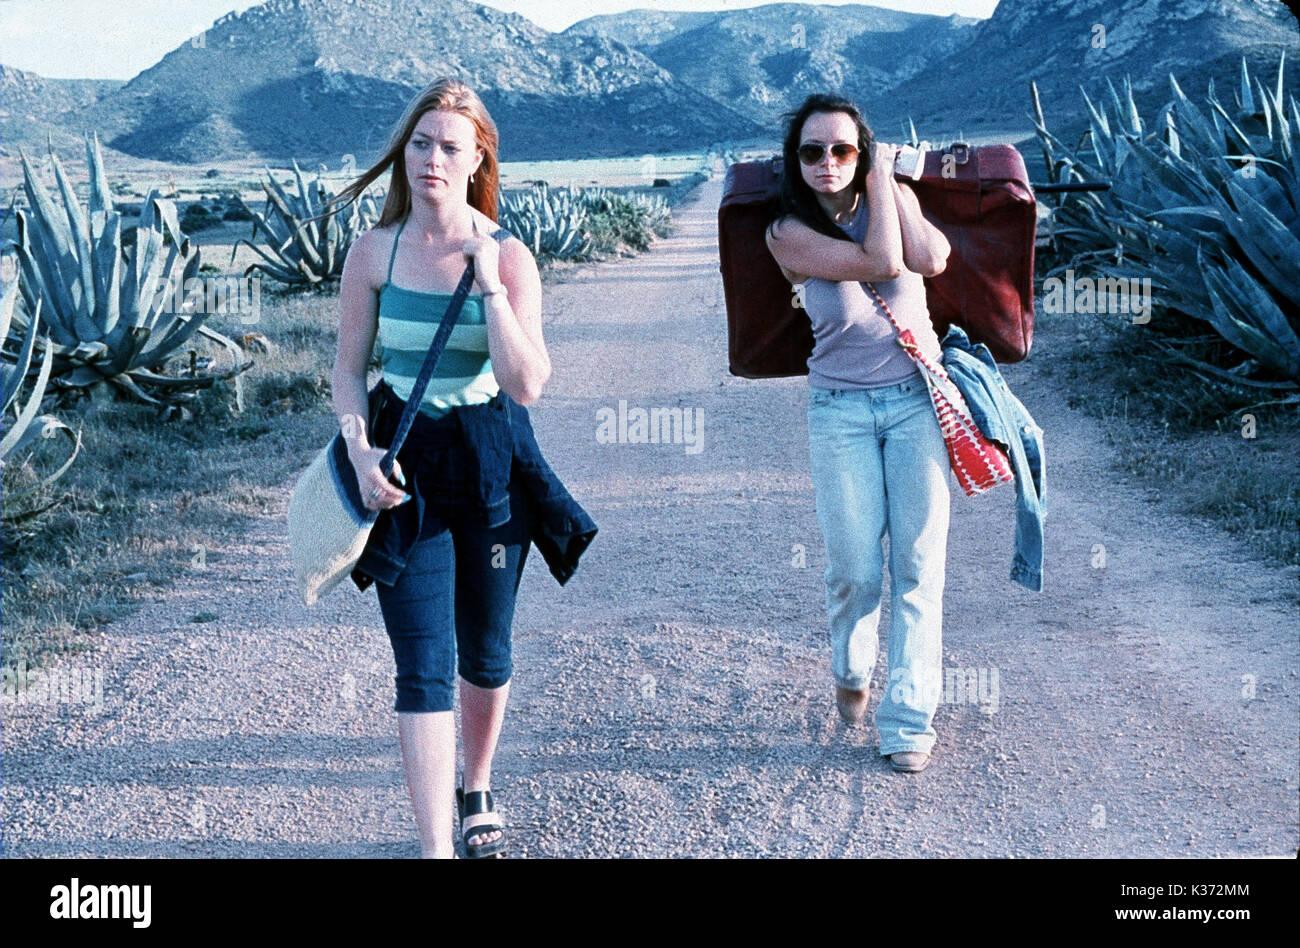 Annabel Maule,Helen McCrory (born 1968) XXX picture Emily DiDonato,Diane Bond